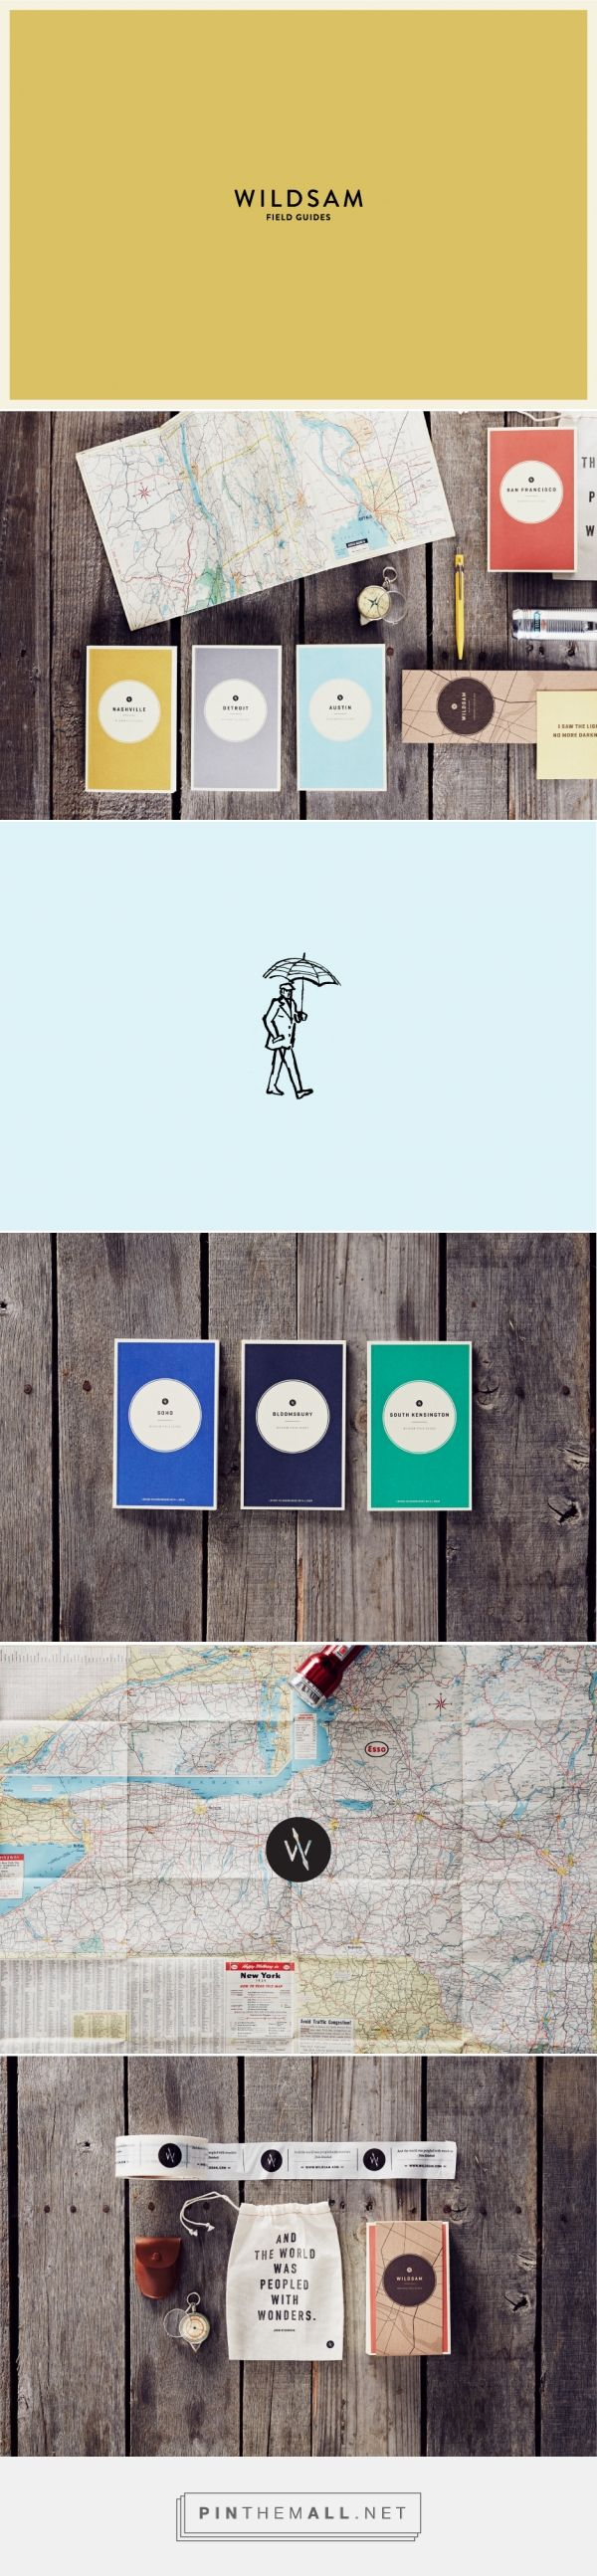 Wildsam Field Guide Branding by Stitch Design Co. | Fivestar Branding – Design and Branding Agency & Inspiration Gallery